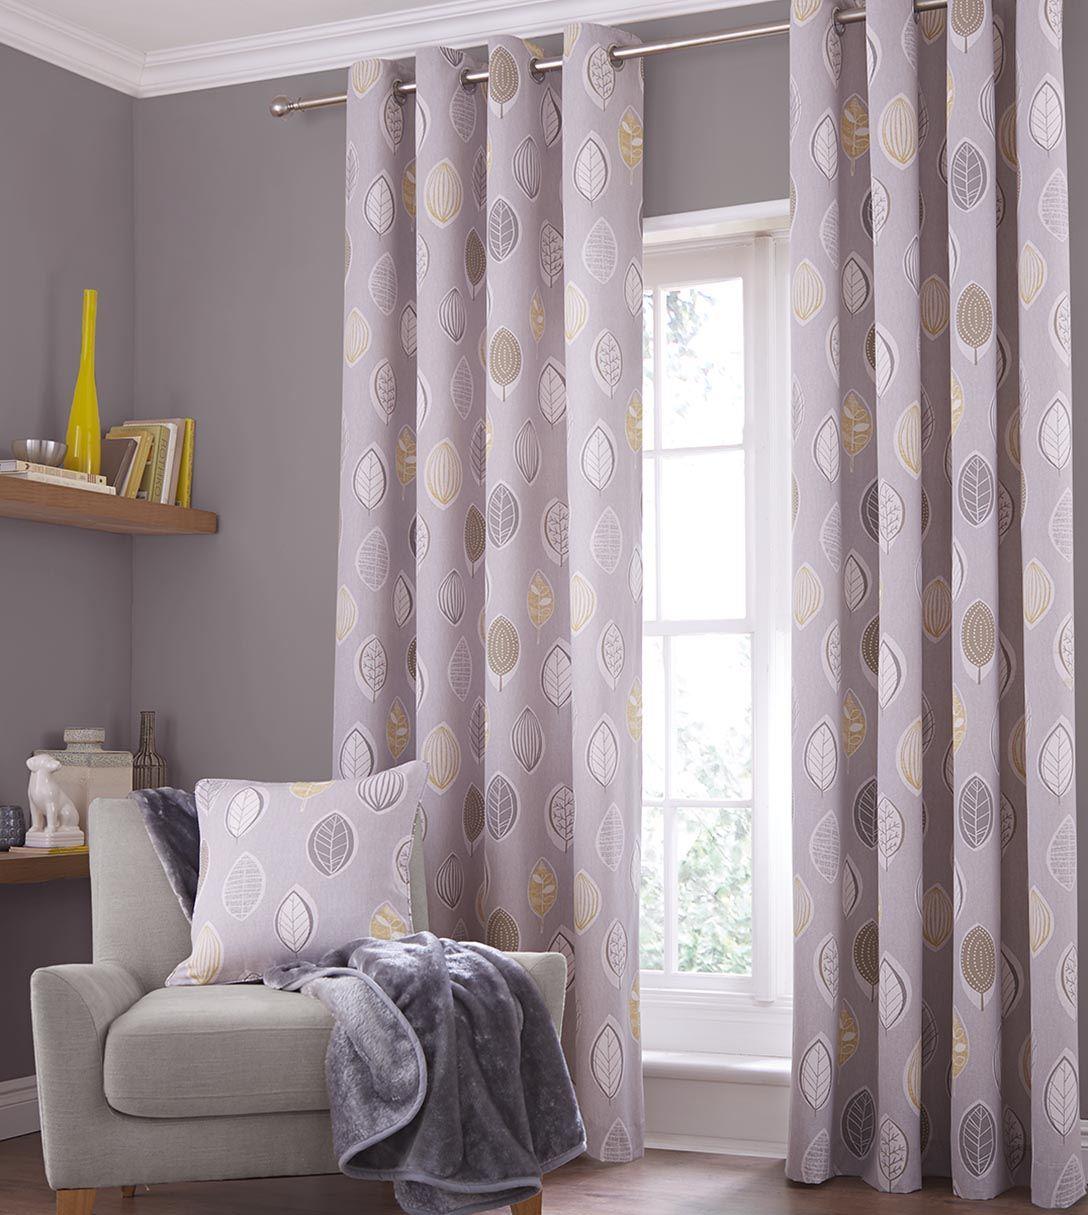 Skandi Leaves Readymade Lined Ring Top Eyelet Modern Curtains Natural Grey